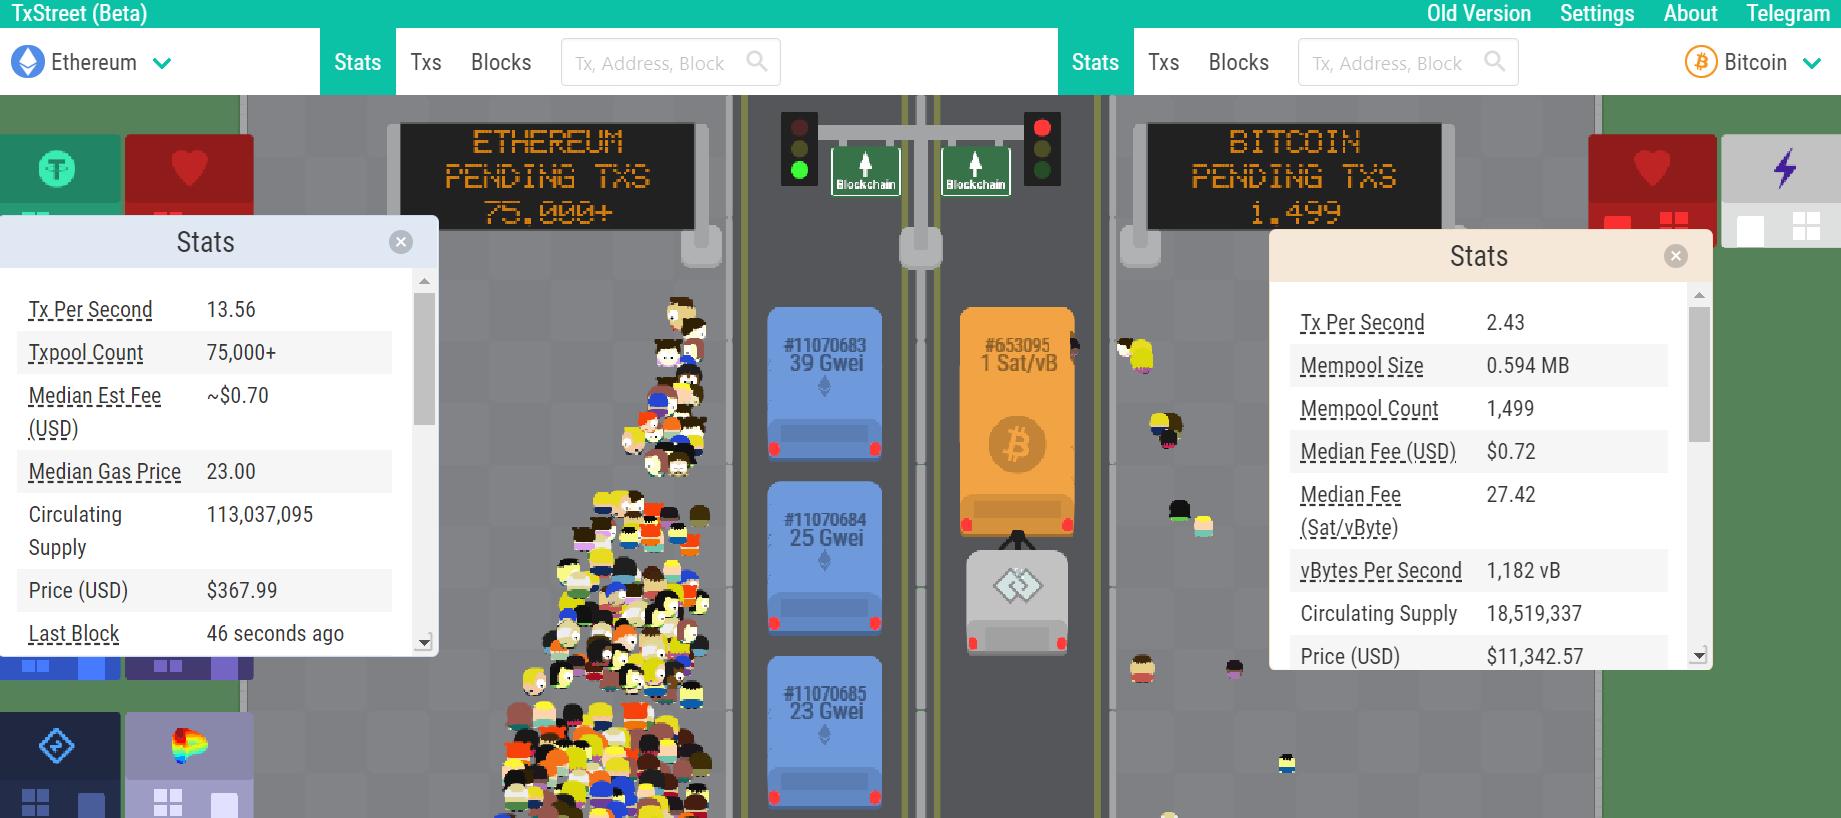 TxStreet图示BTC、ETH实时交易